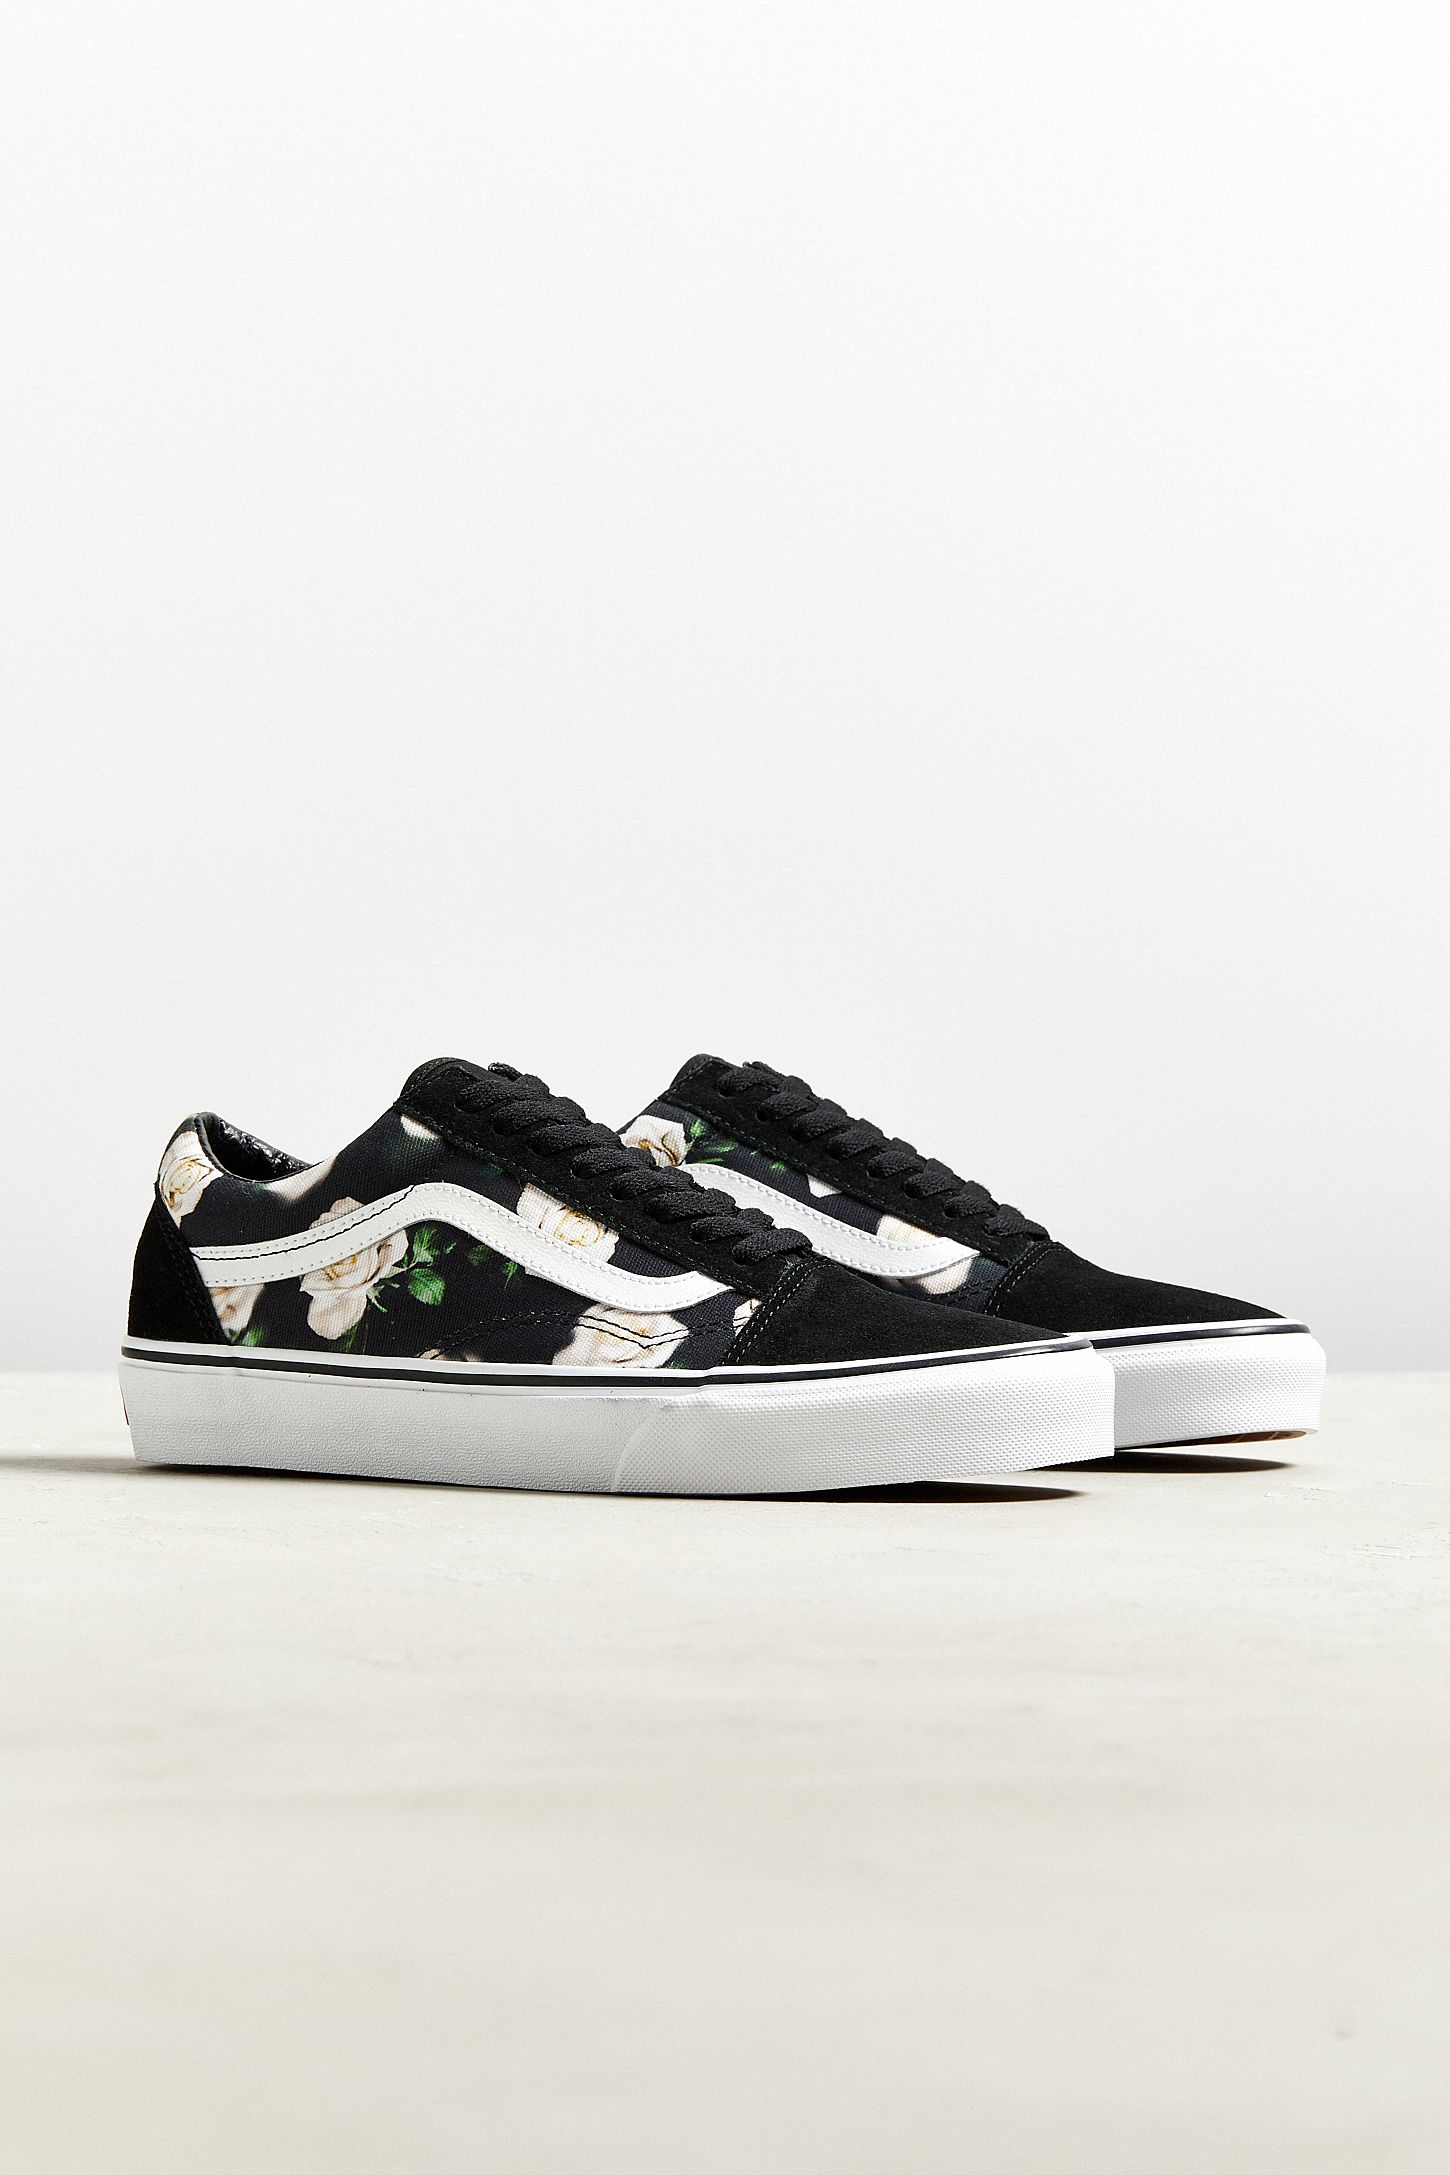 48ac65b6266e Vans Old Skool Romantic Floral Sneaker | Urban Outfitters